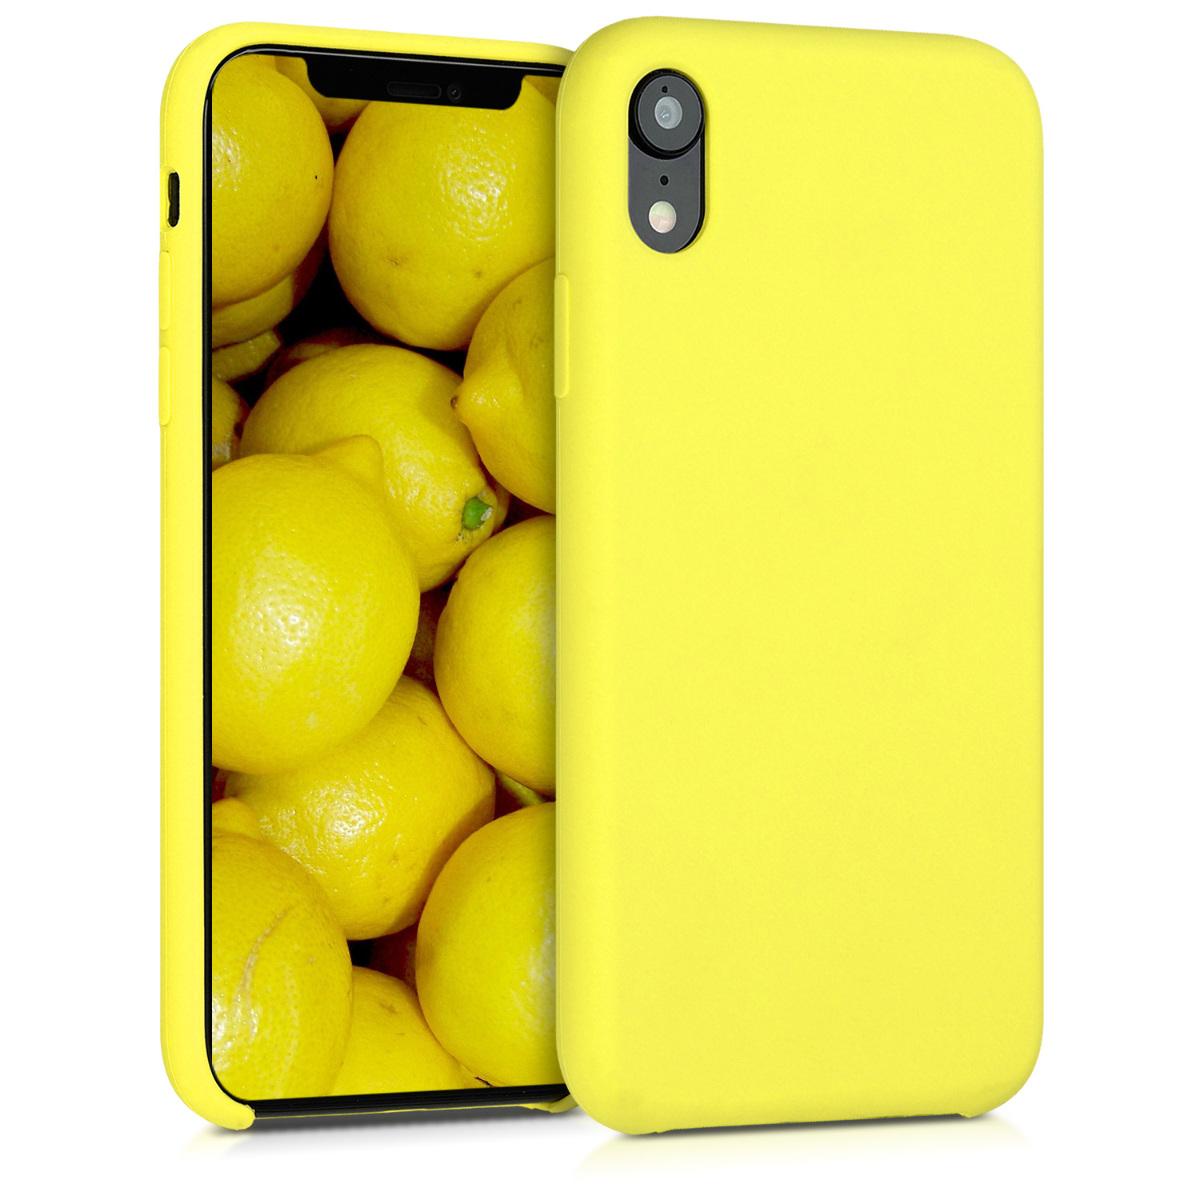 KW Θήκη Σιλικόνης iPhone XR - Neon Yellow - (45910.75)